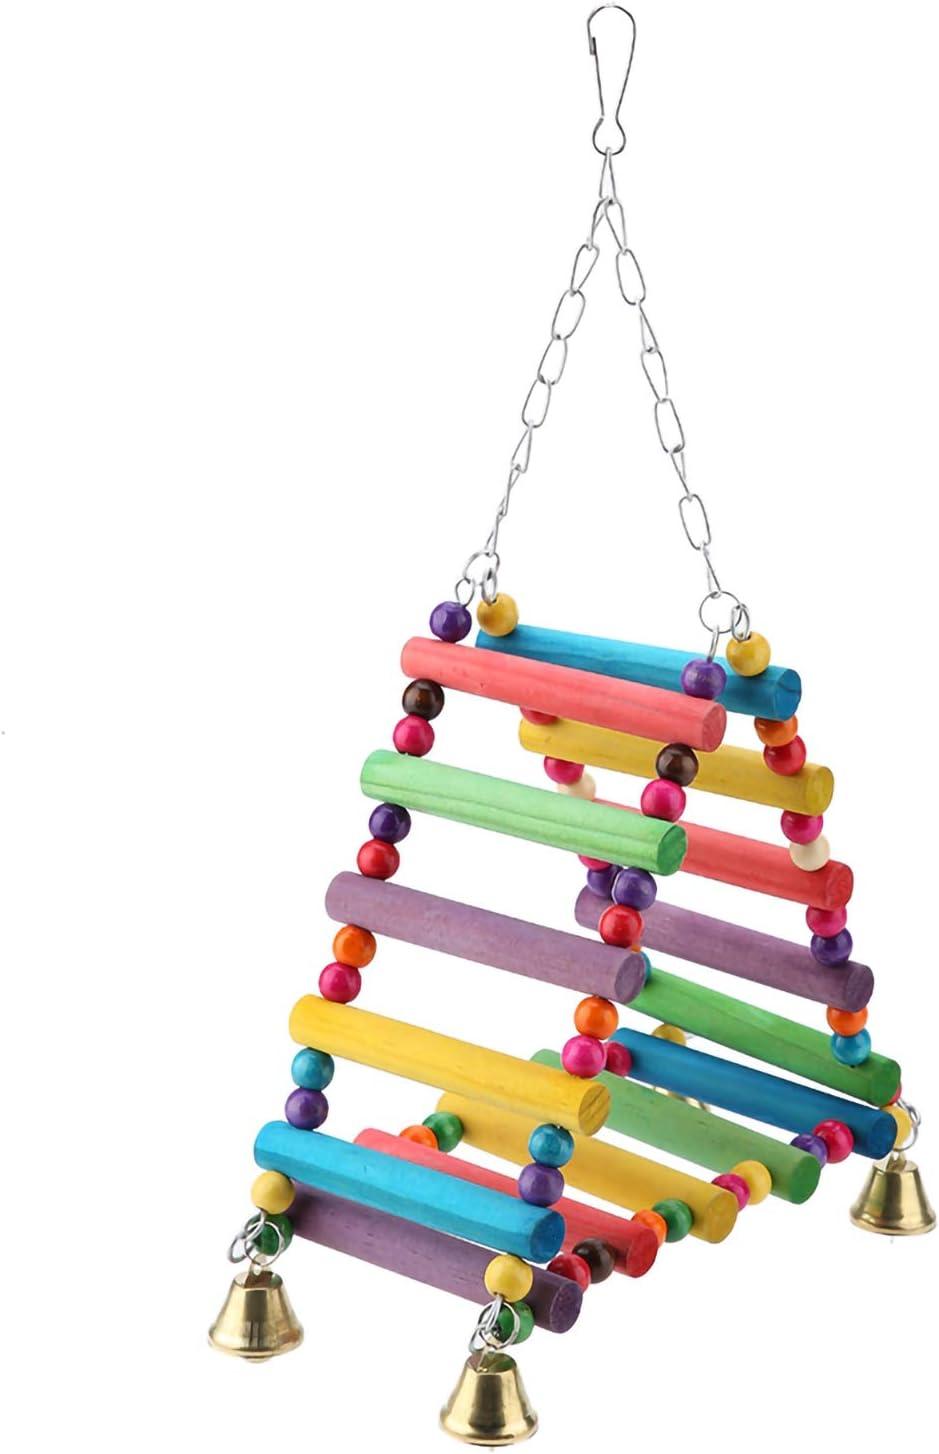 Pet Bridge Swing Bird Ladders In a popularity Reservation Parrot Wood Per Bells Toys